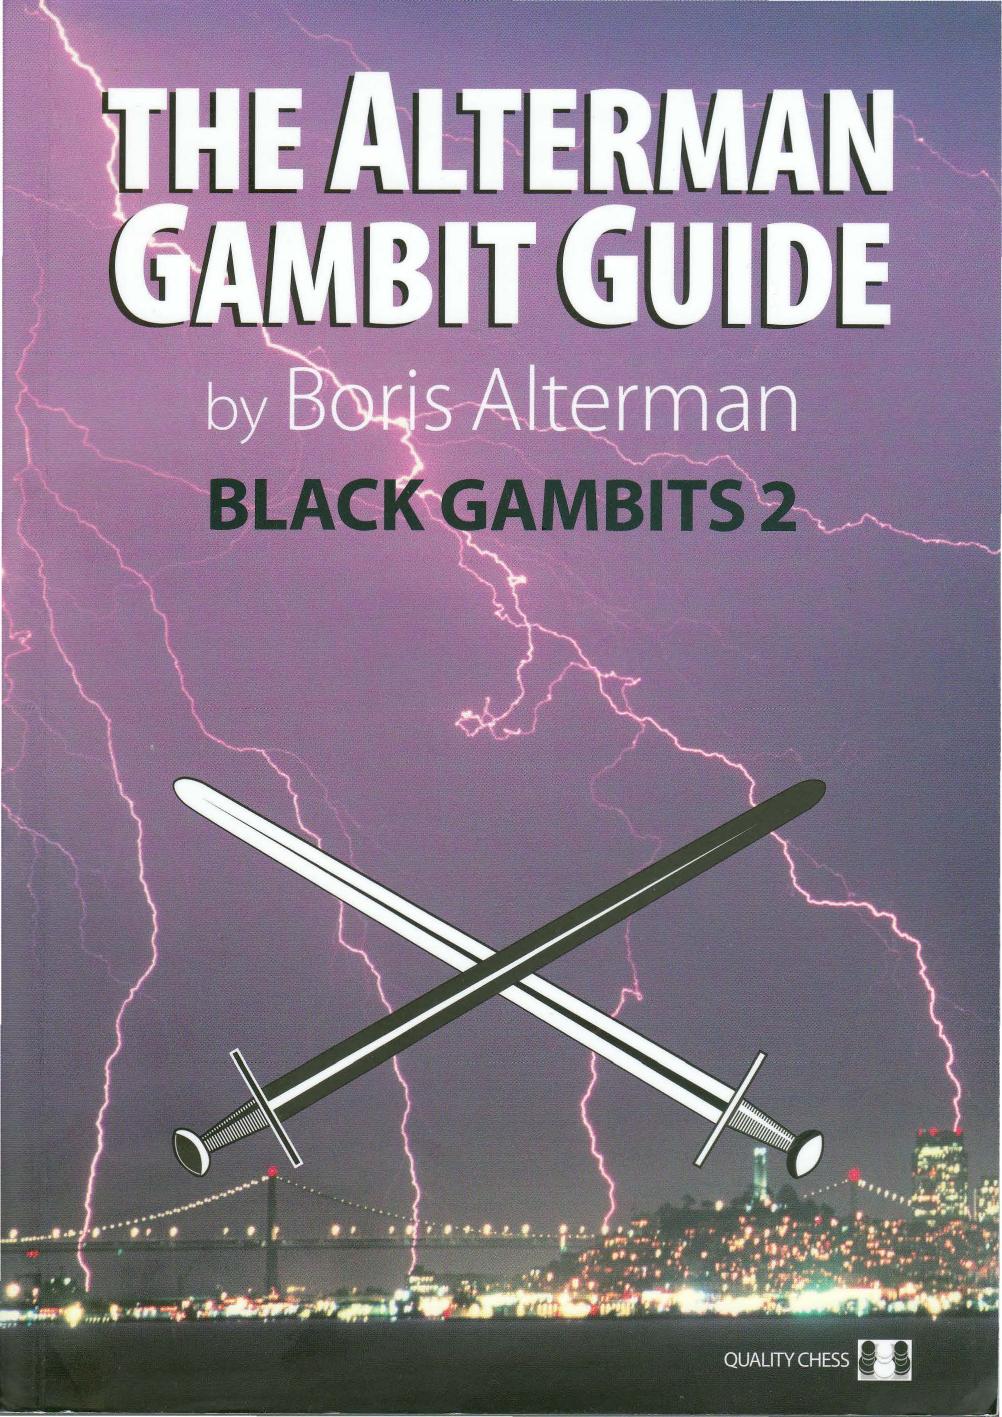 The Alterman Gambit Guide Black Gambits 2